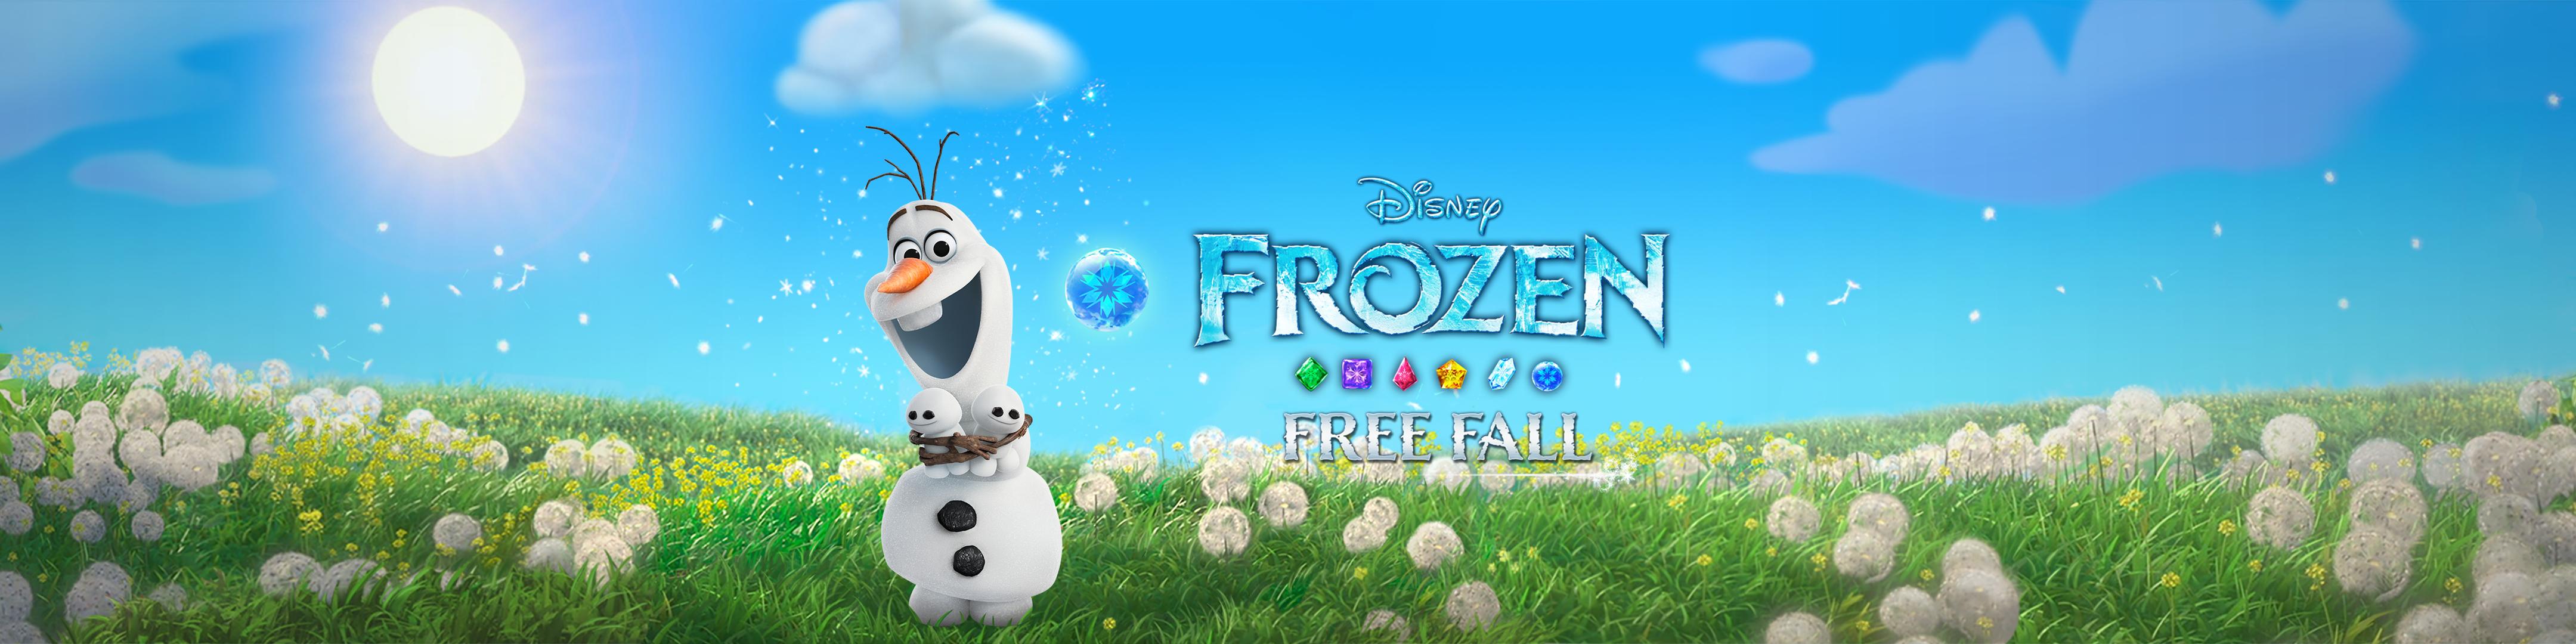 Frozen Free Fall - Revenue & Download estimates - Apple App